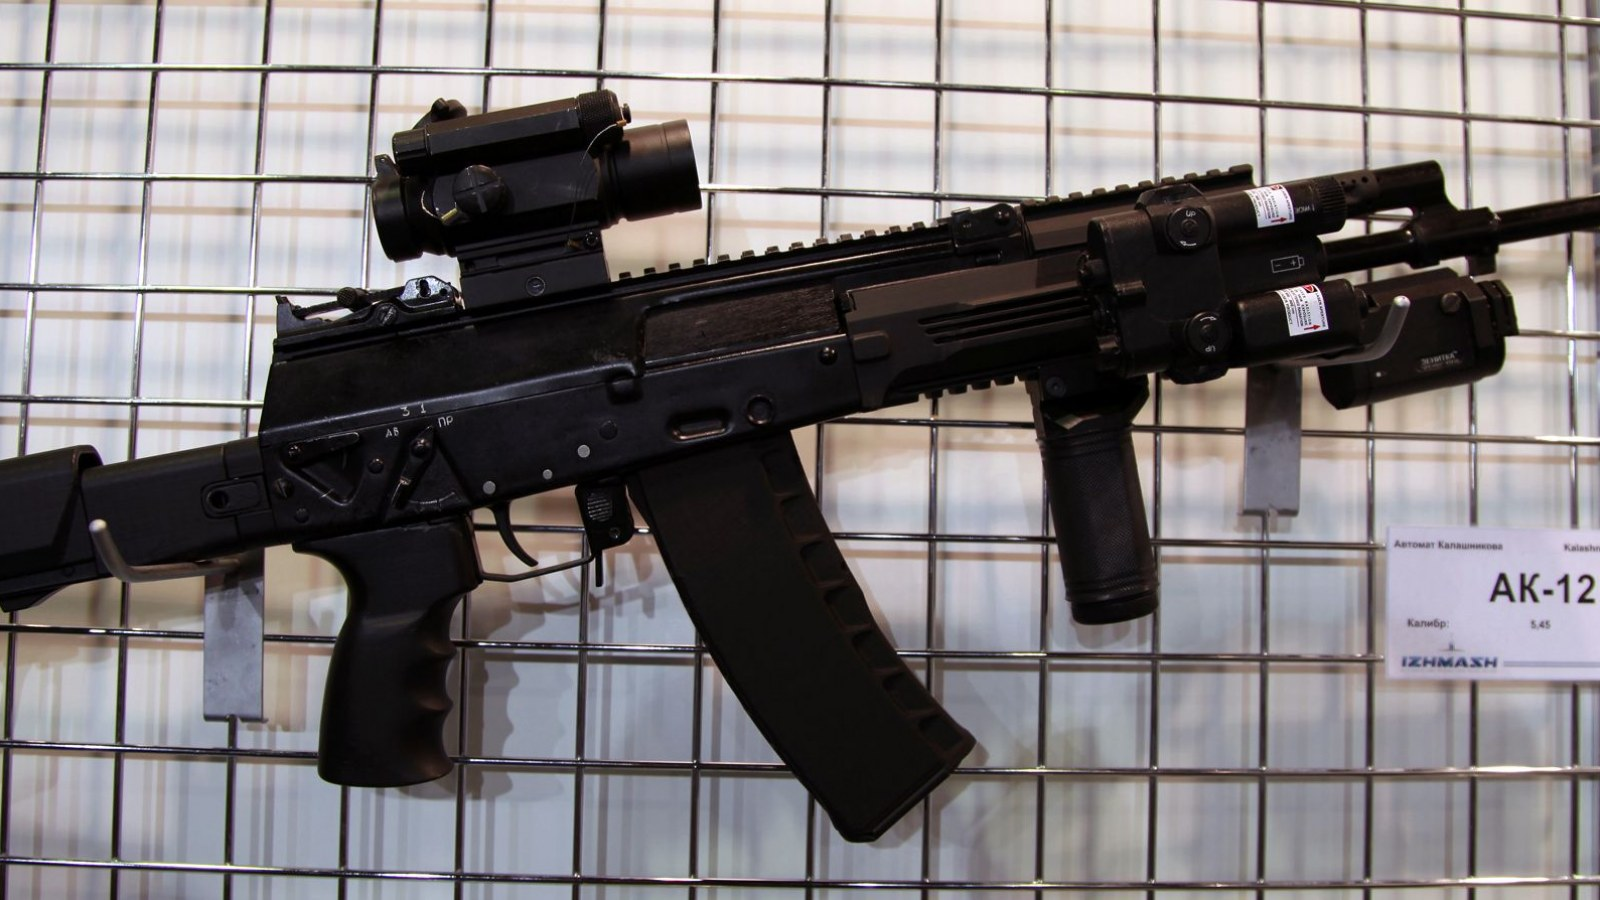 New Kalashnikov Aims to Restore Brand to Former Glory